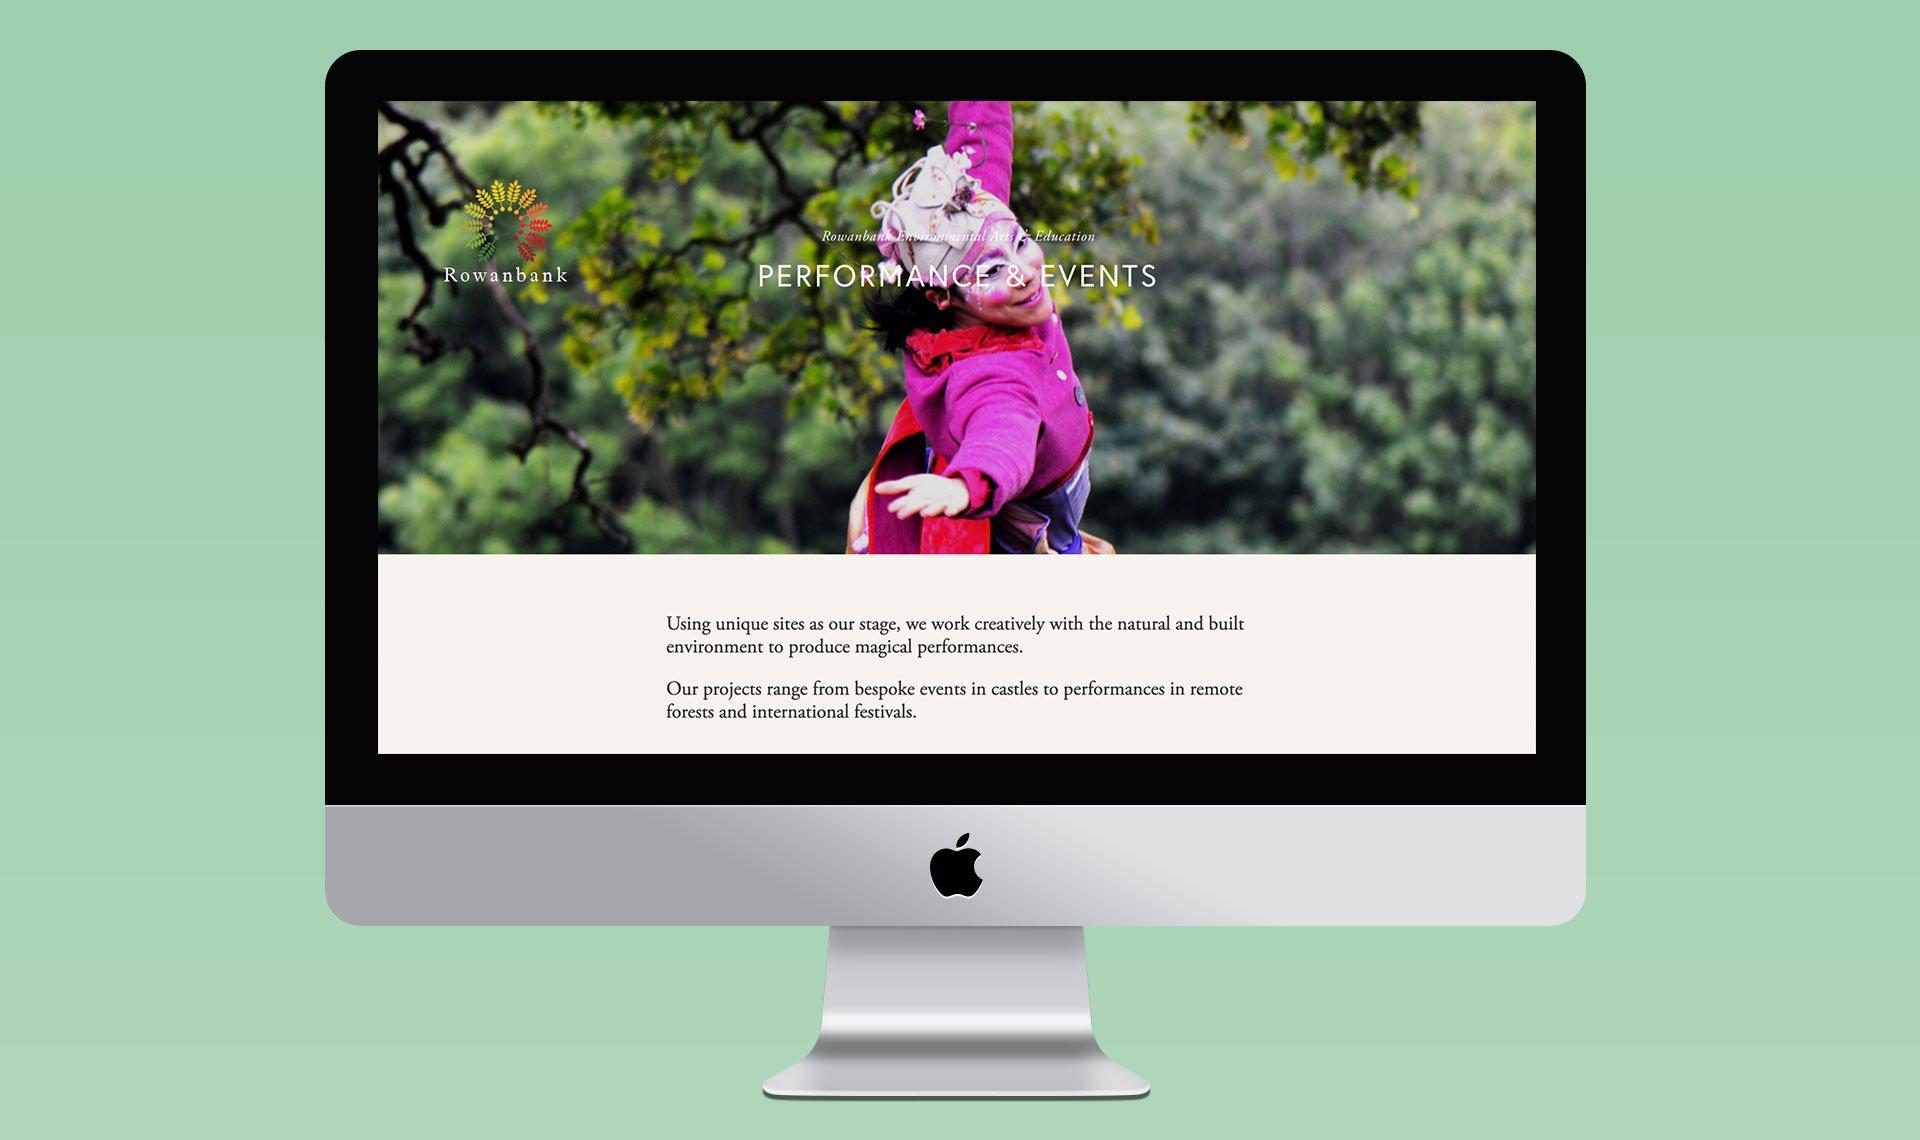 Rowanbank Environmental Arts Web design Image on an iMac Screen